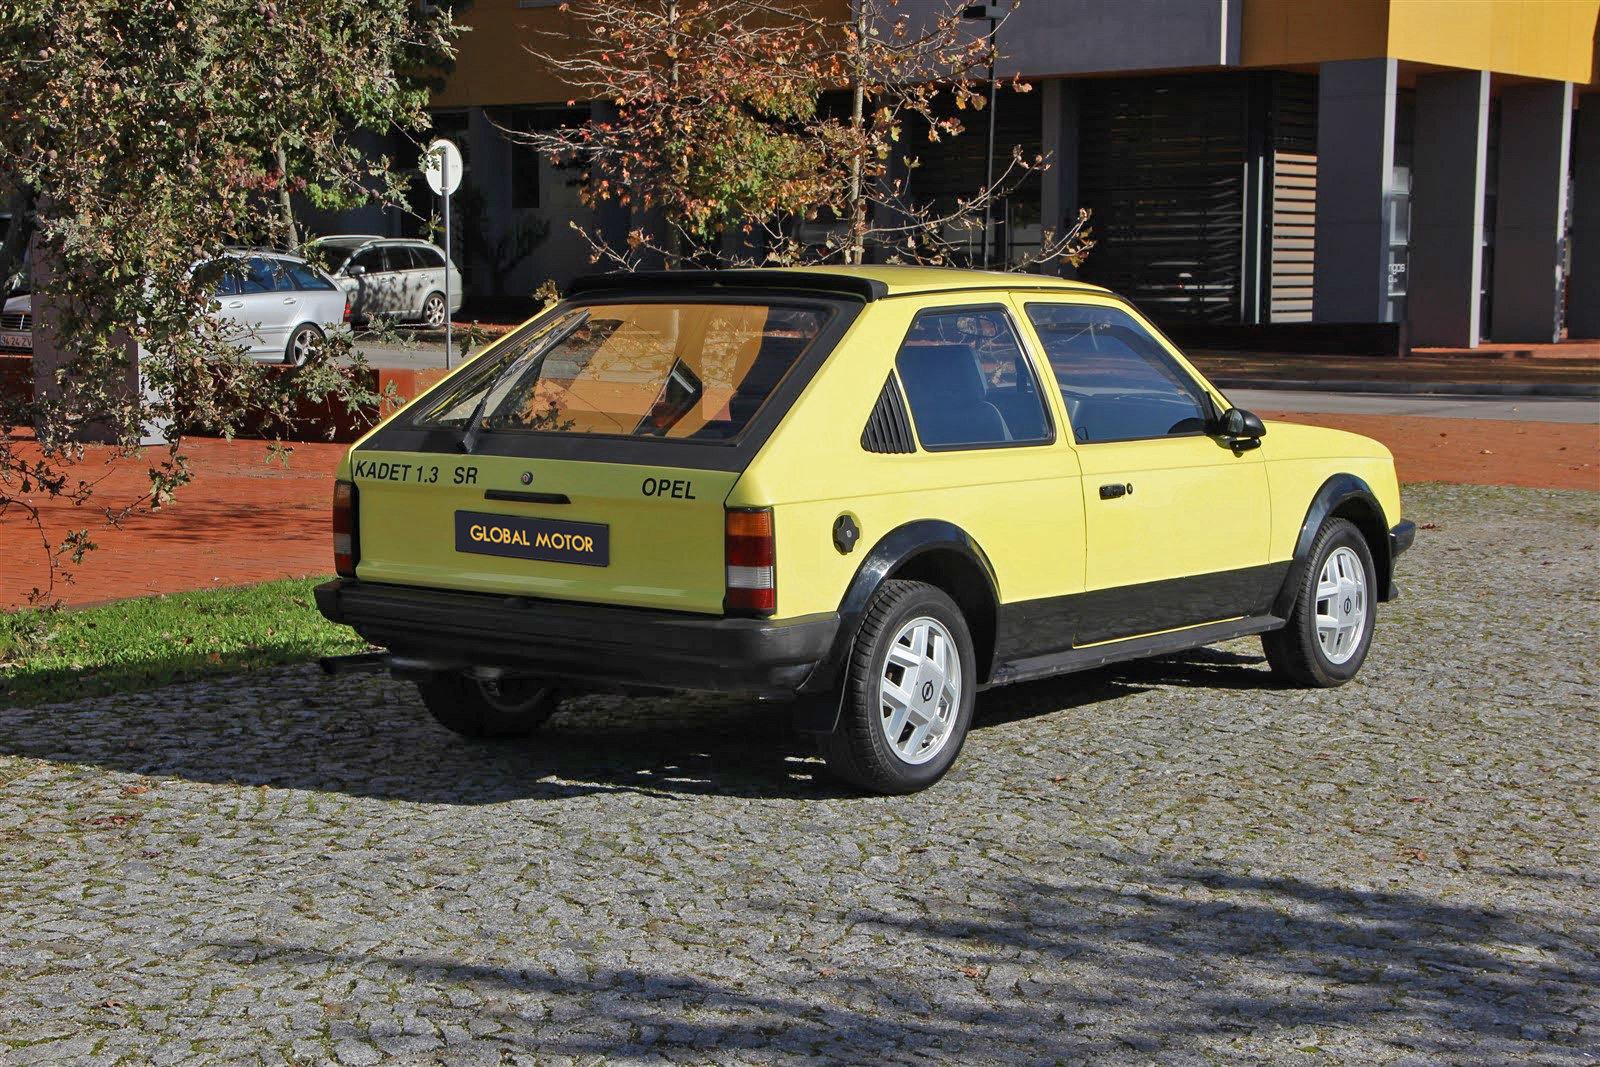 1981 Vauxhall Astra 1.3 SR | Opel Kadett 1.3 SR For Sale (picture 2 of 6)